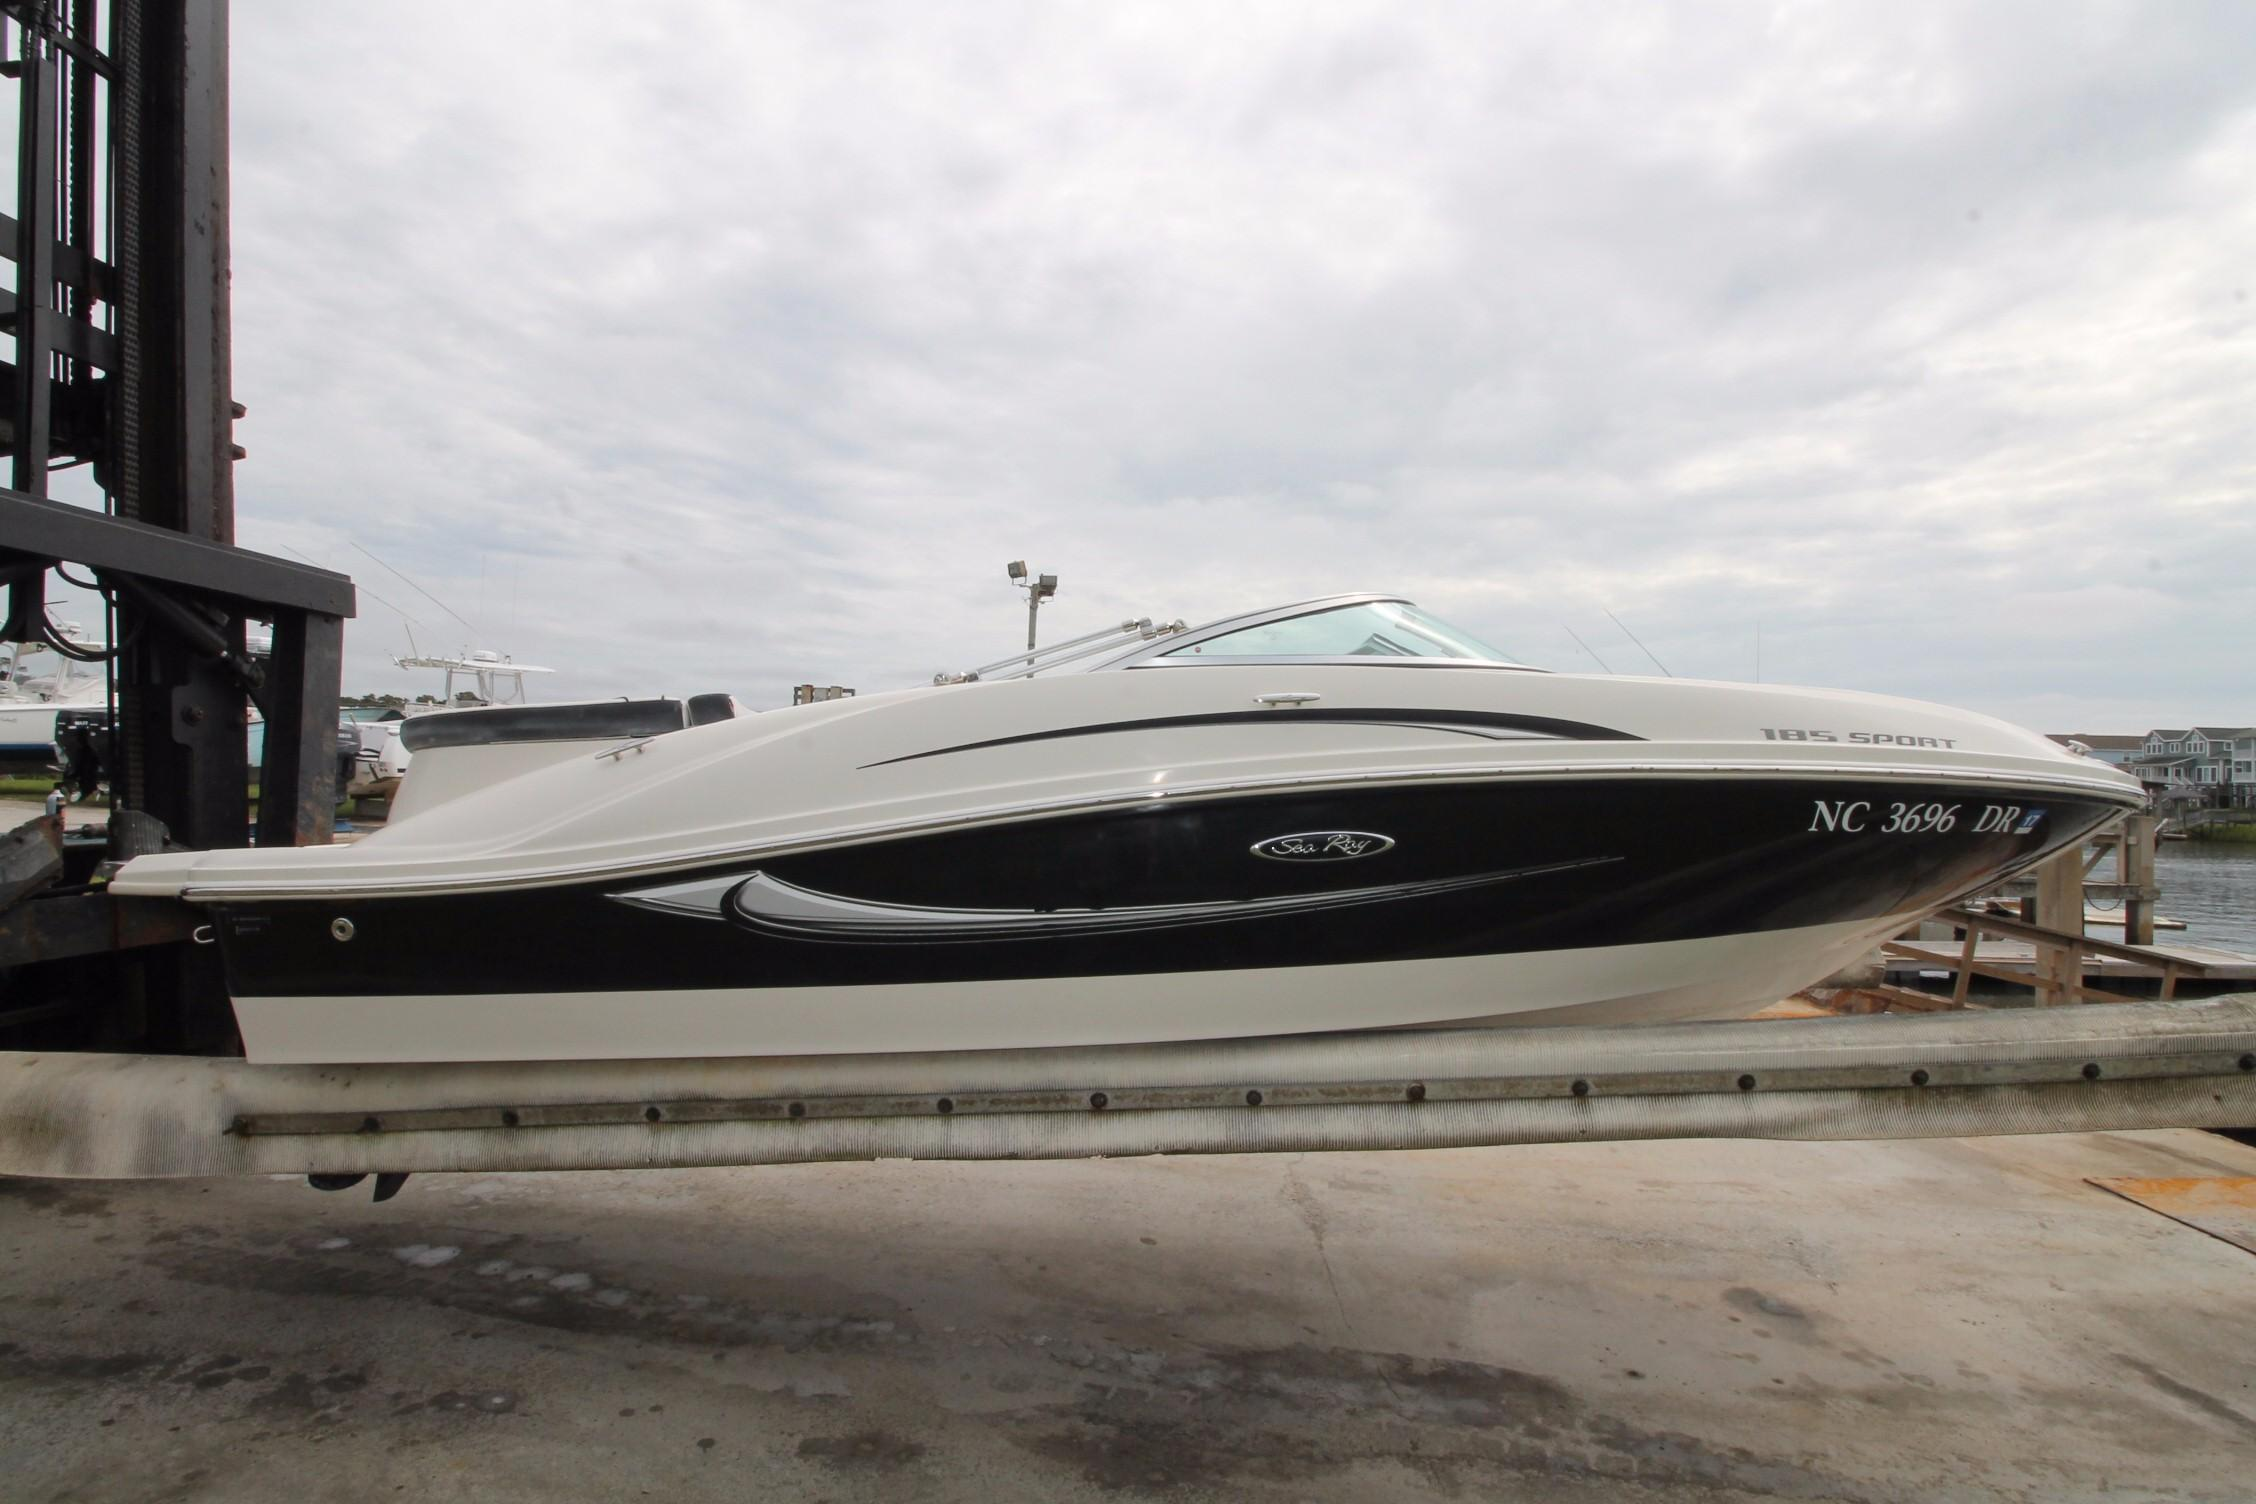 2010 Sea Ray 185 Sport Power Boat For Sale Www